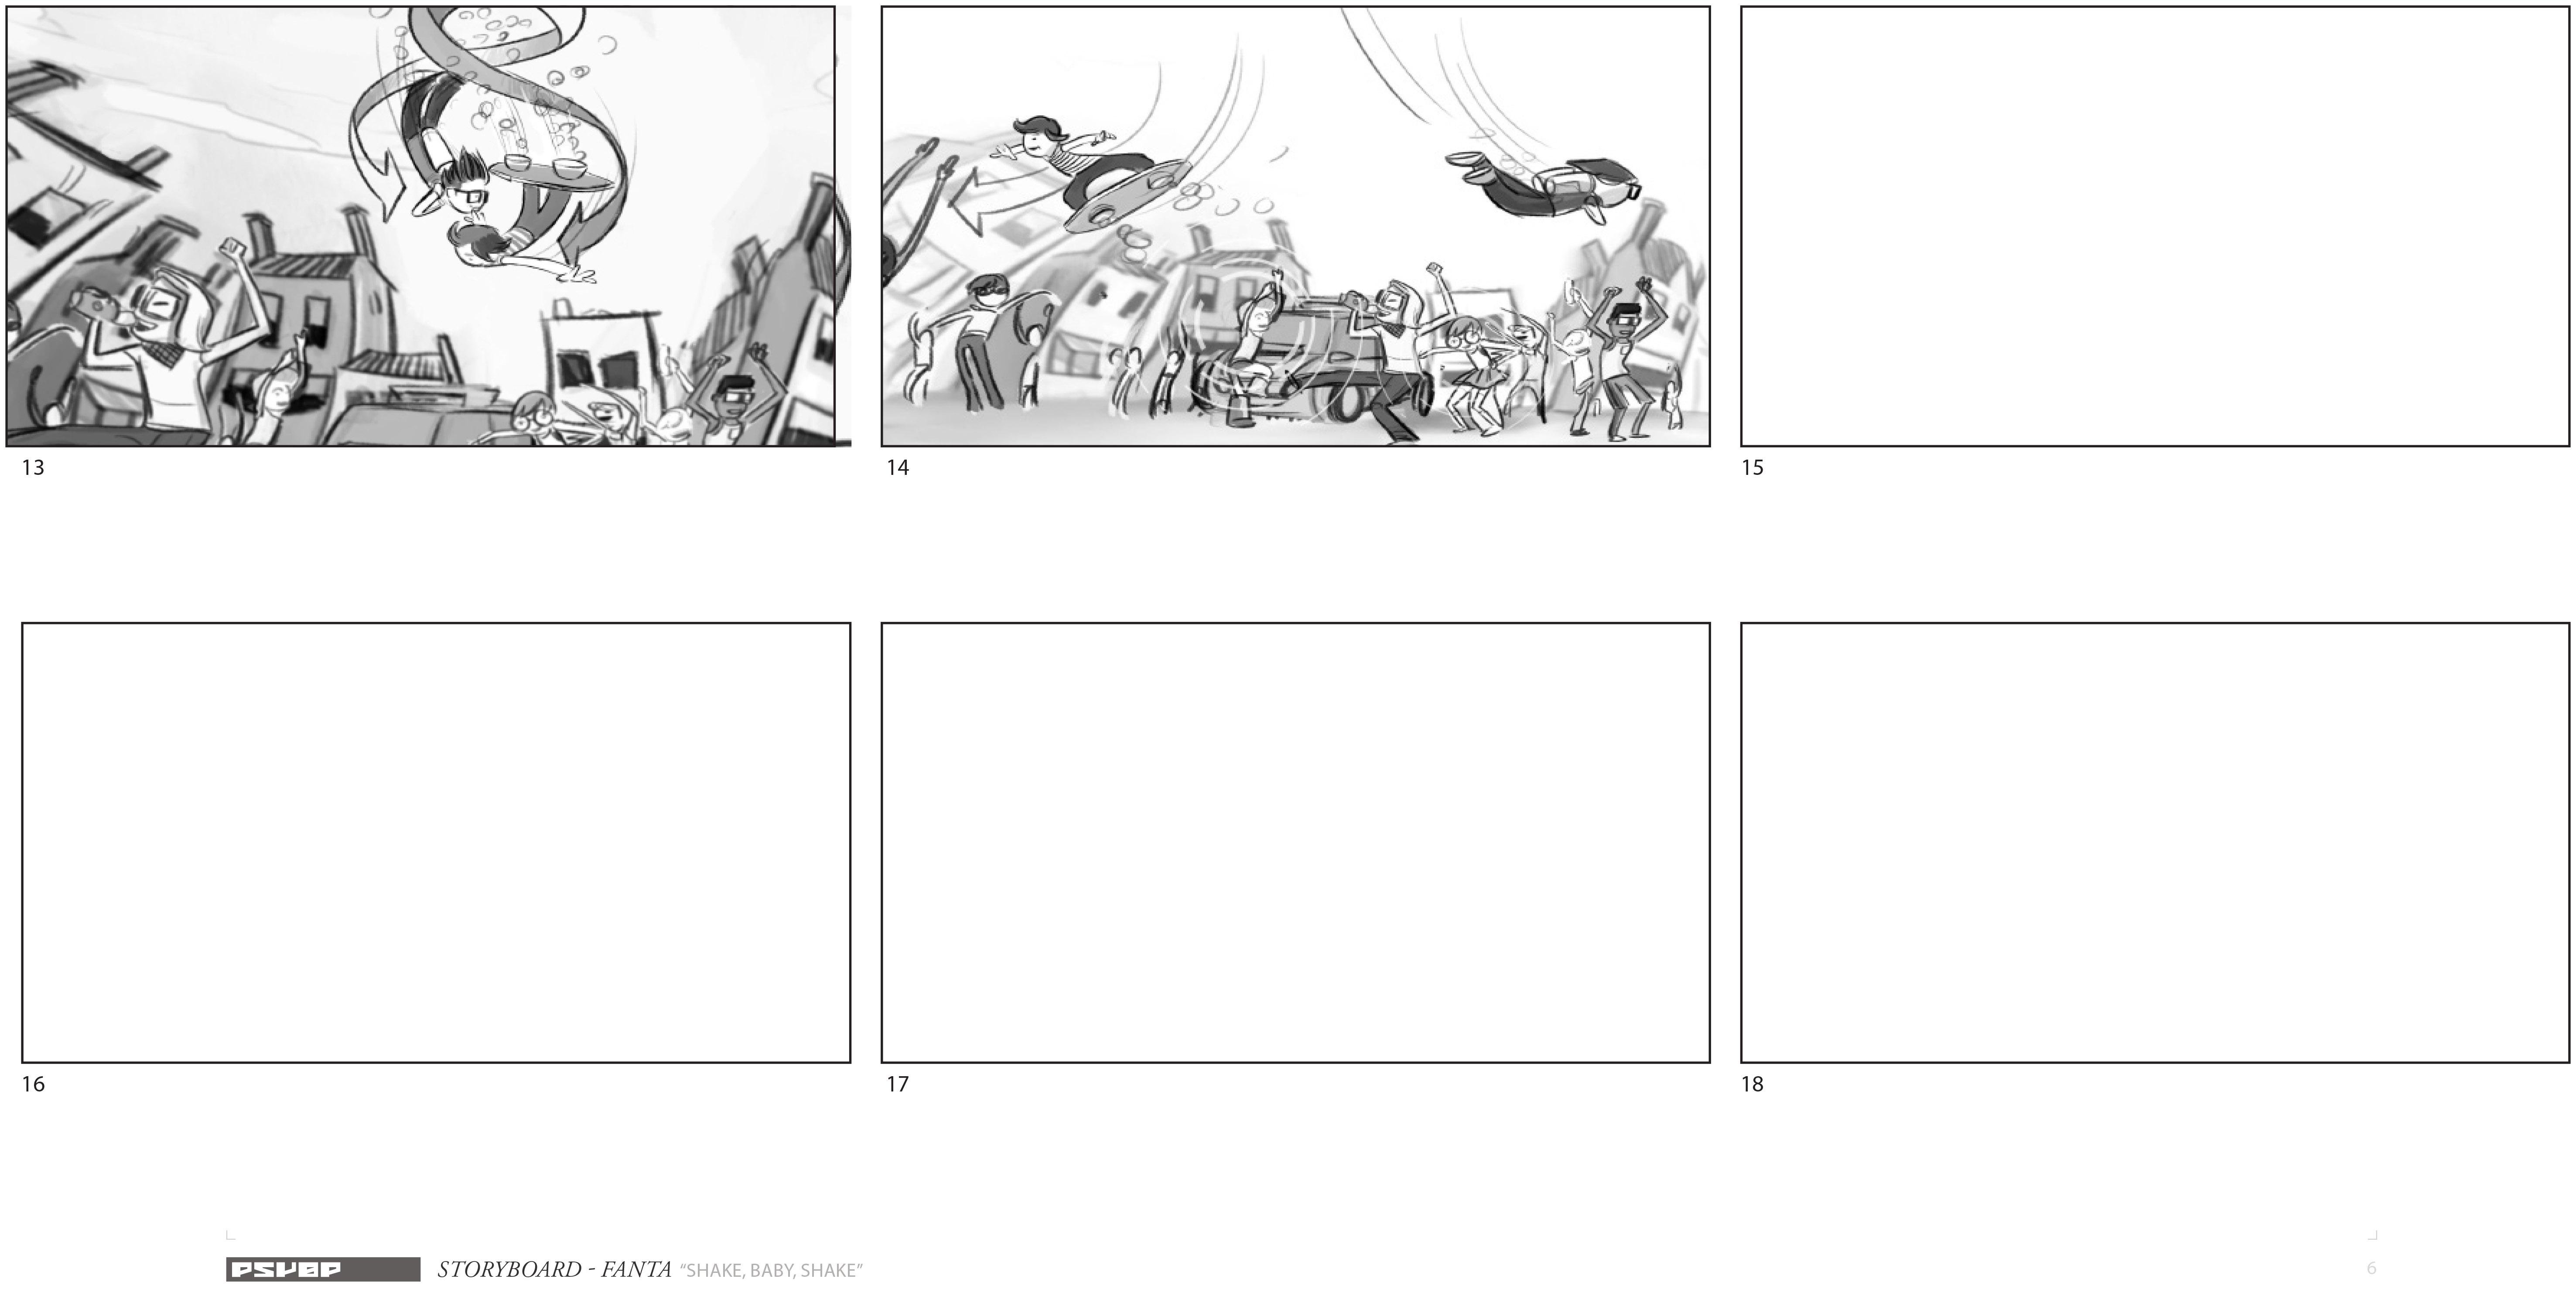 FantaSHAKEBABYSHAKE_Storyboards083013-6